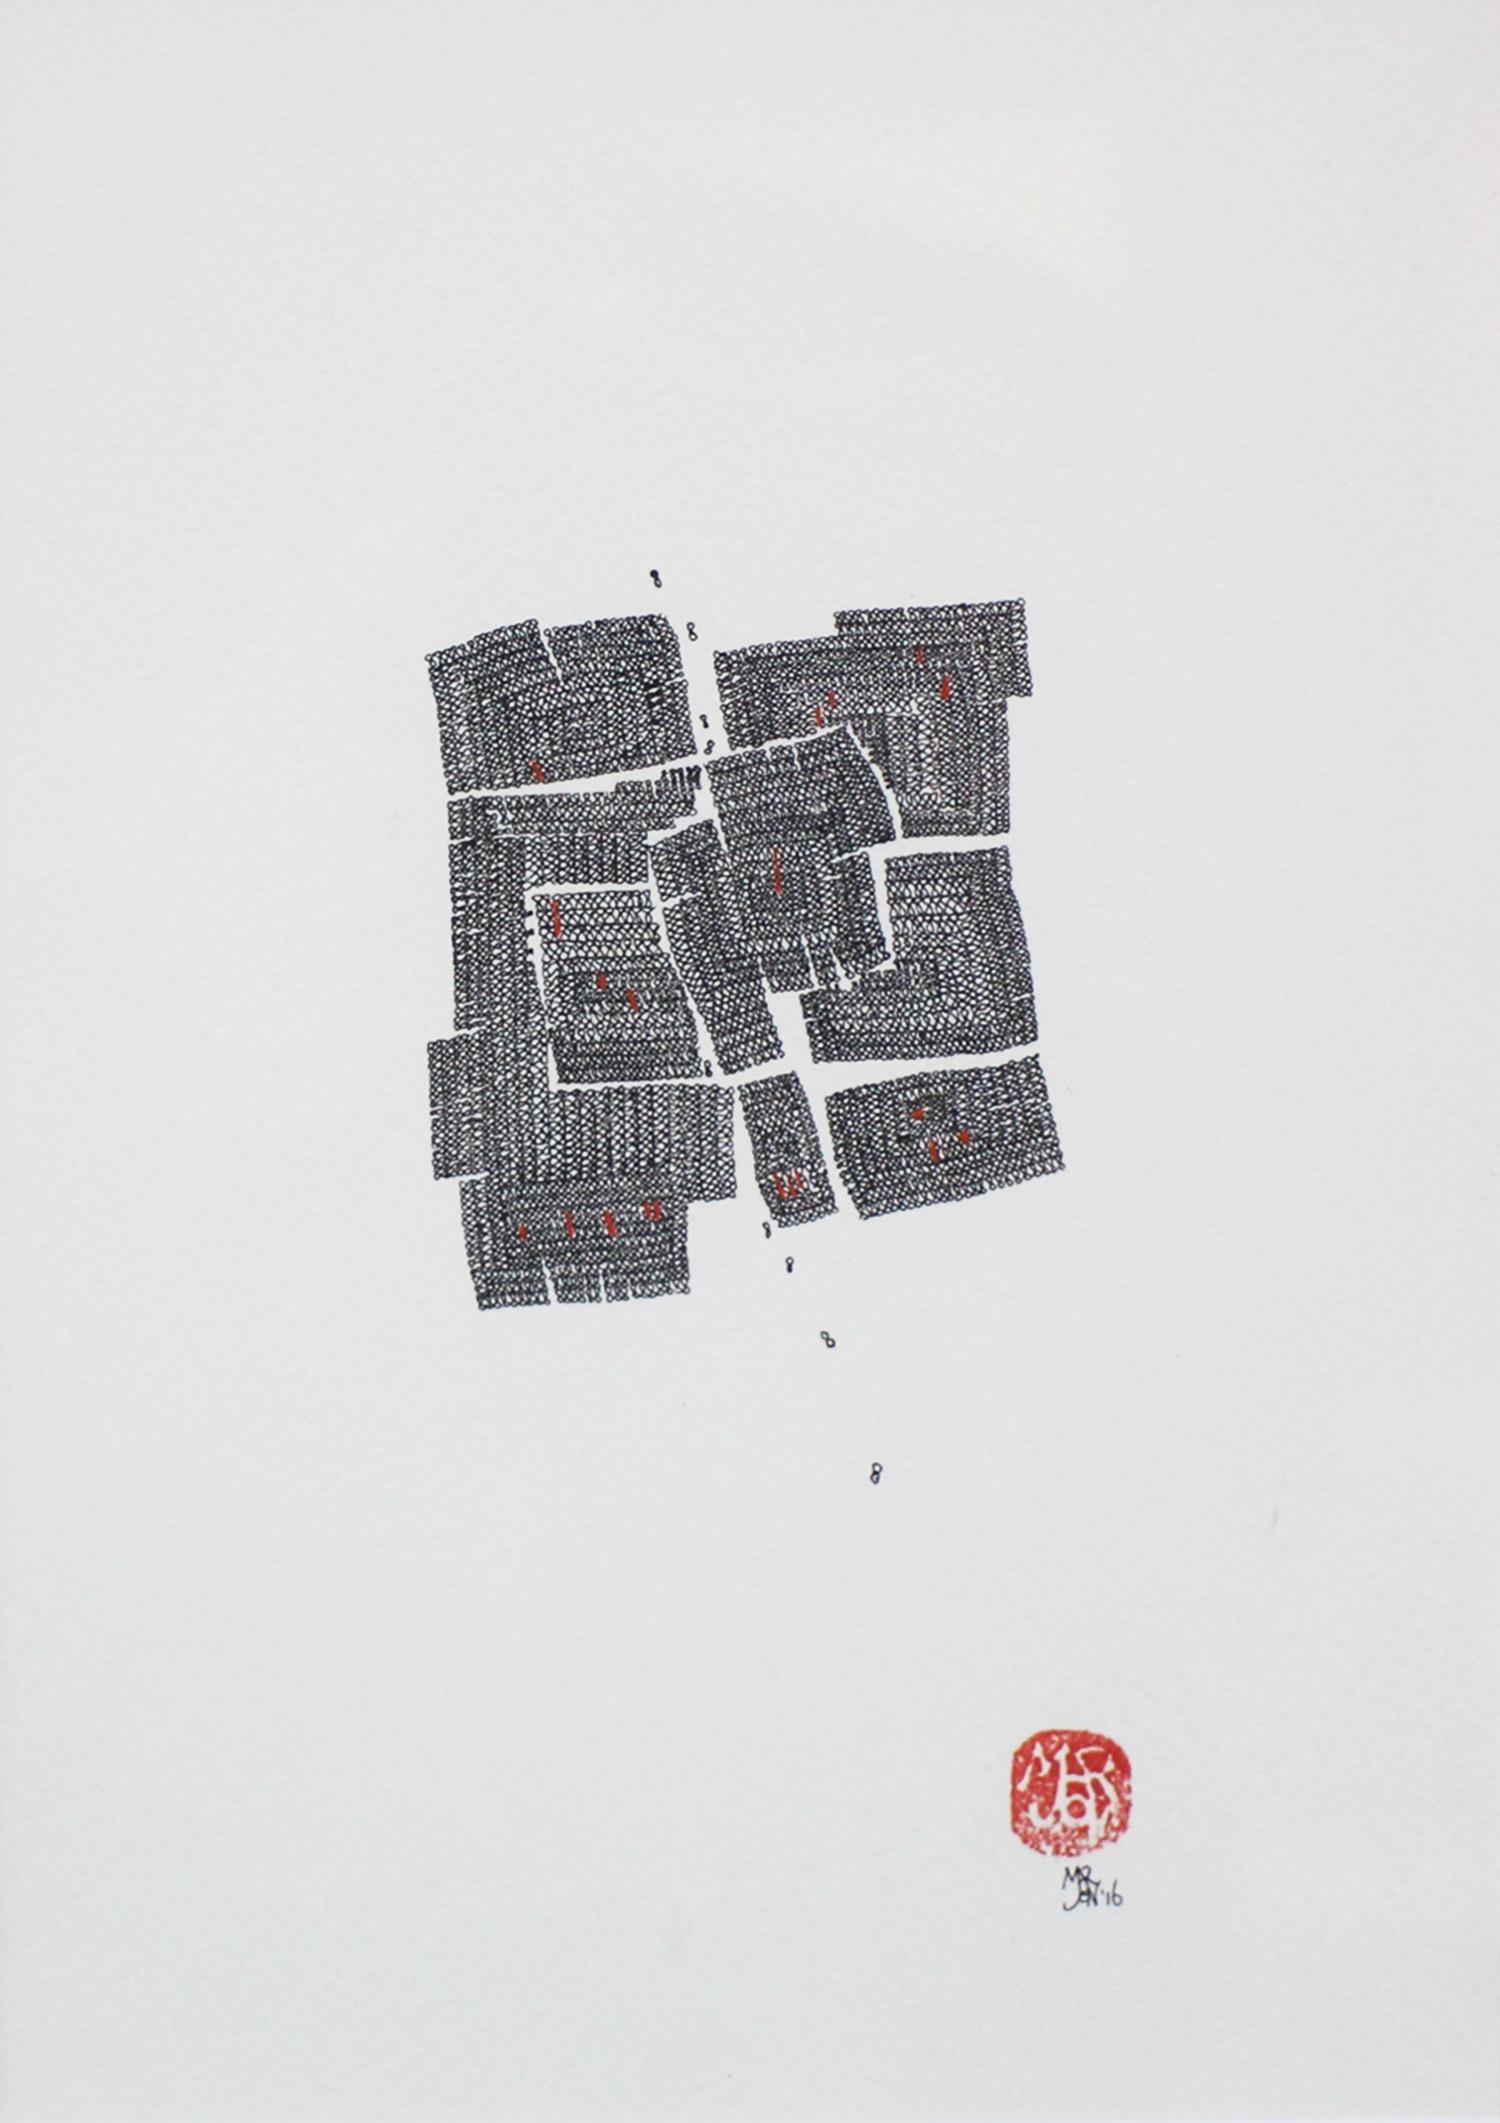 Marjon Barton, Untitled #33(2016), 15x21.5cm, Ink on Paper